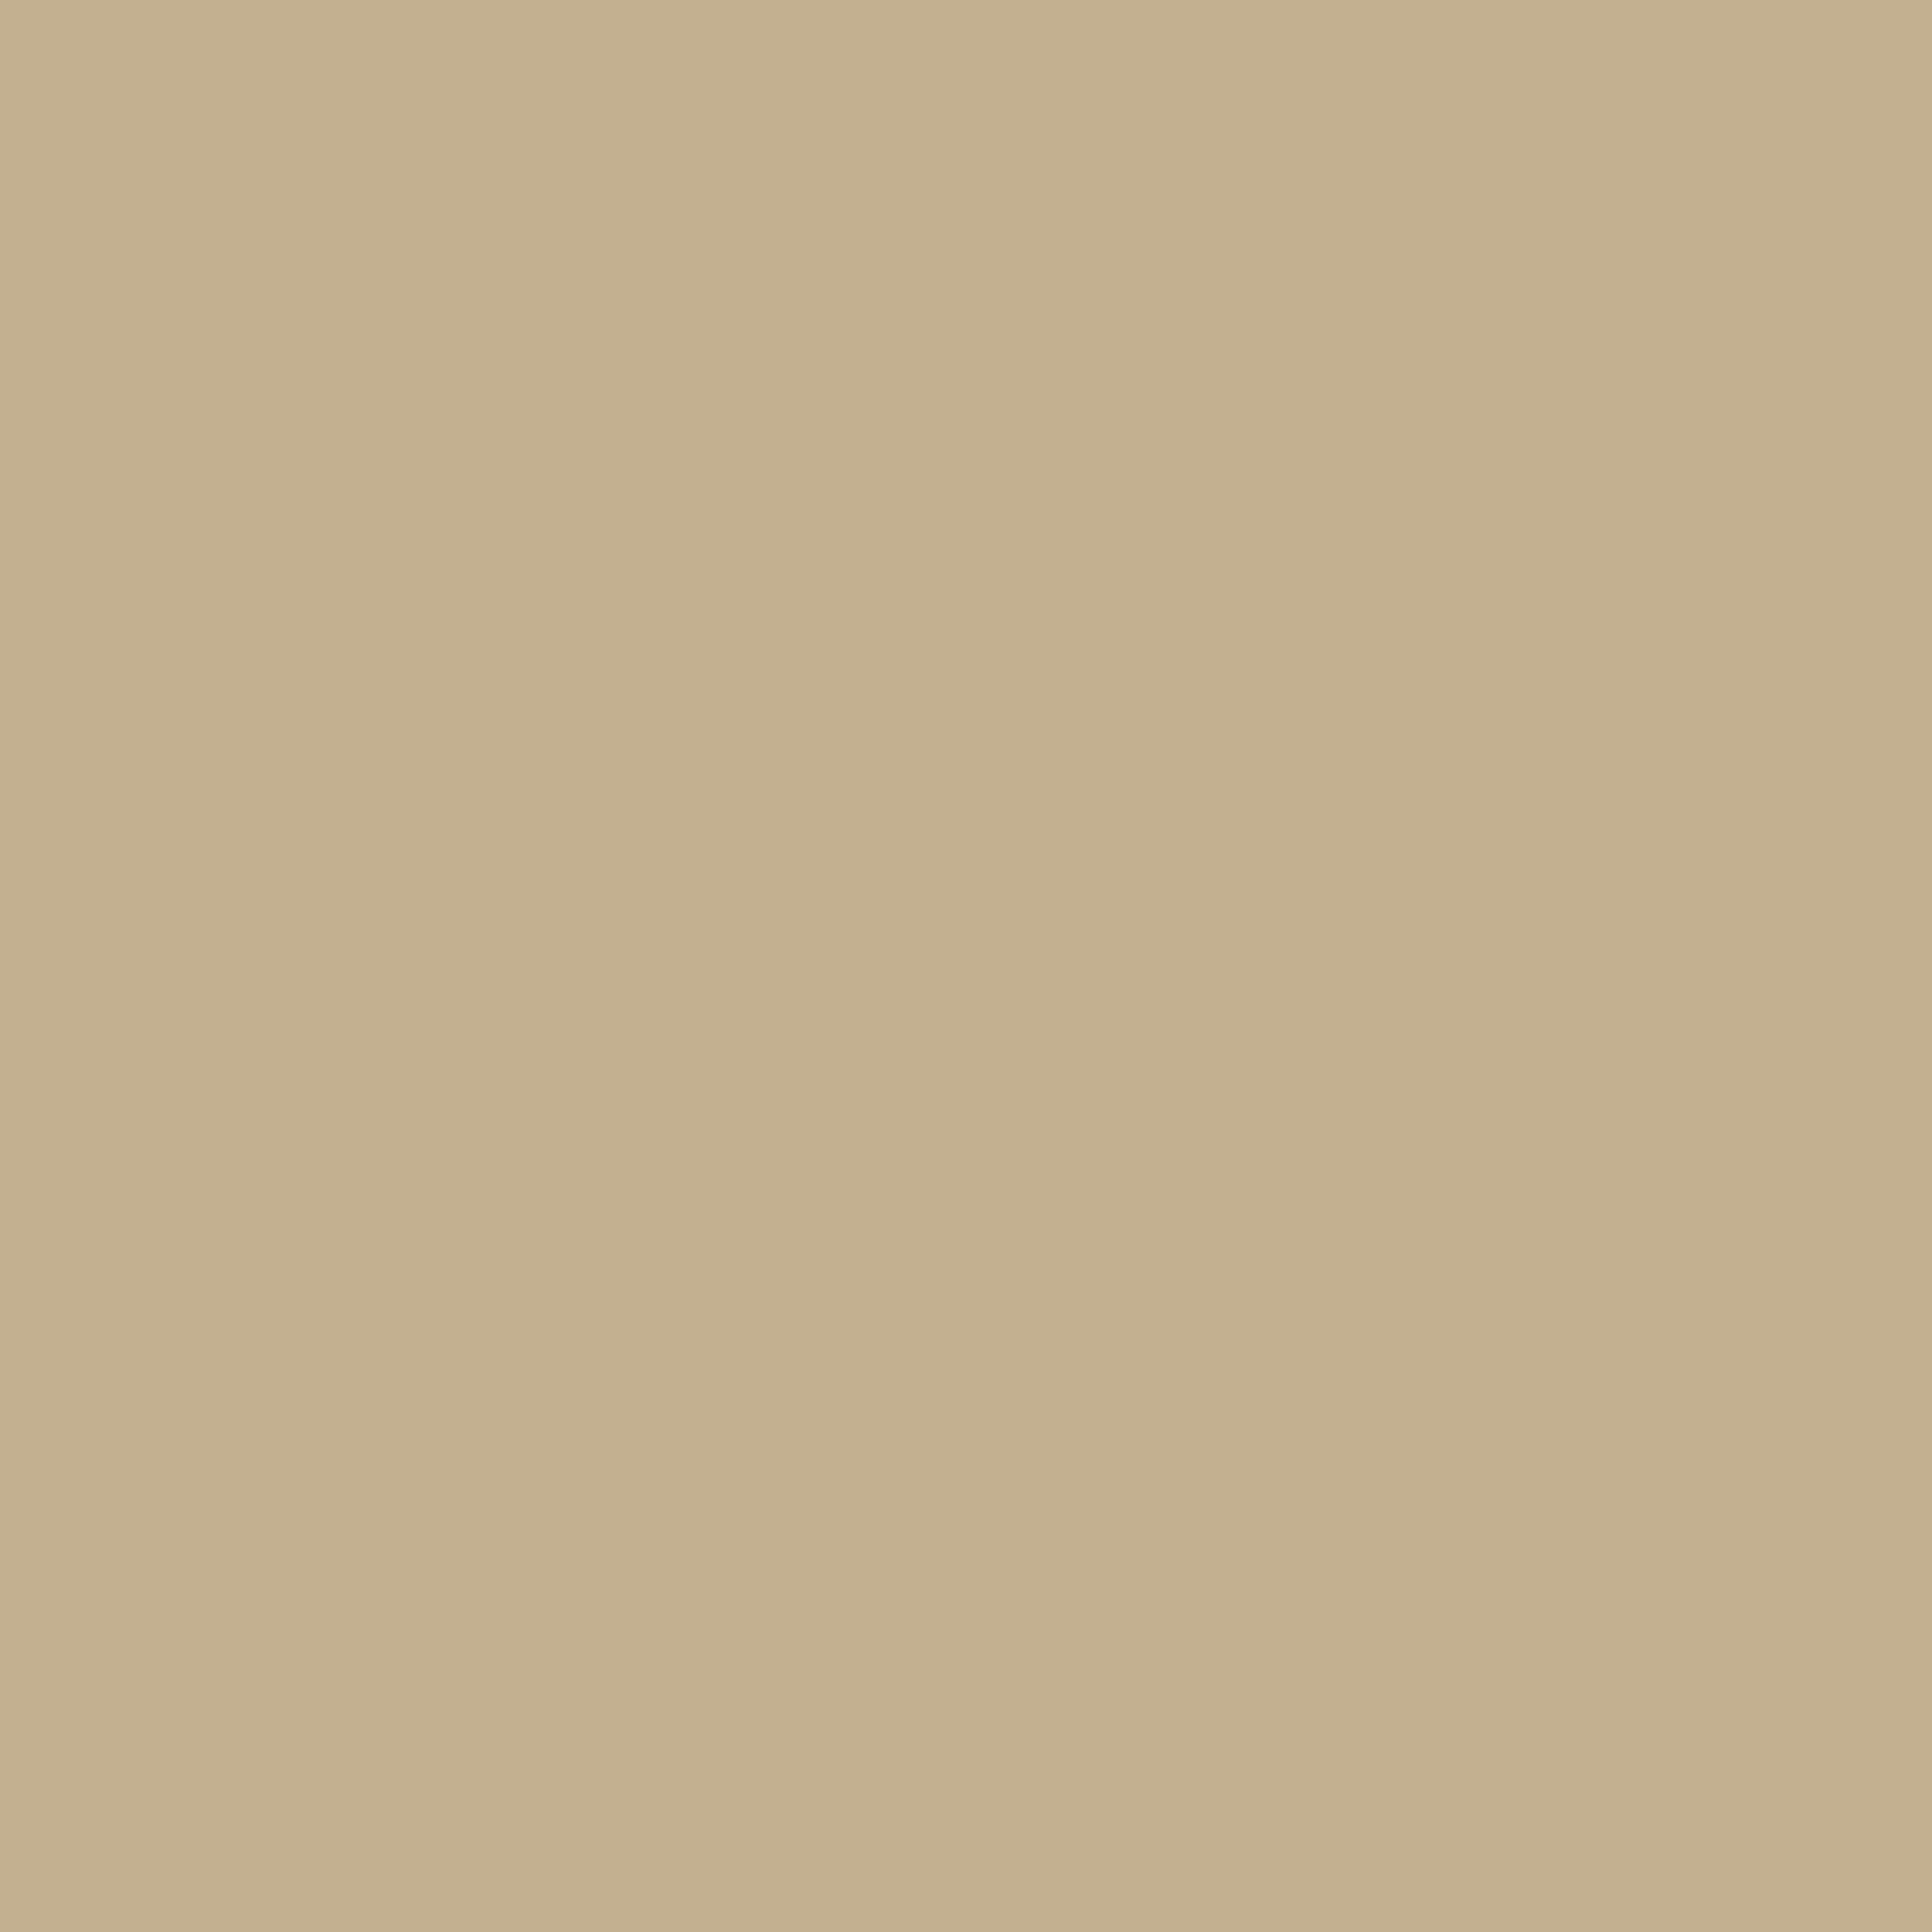 2732x2732 Khaki Web Solid Color Background